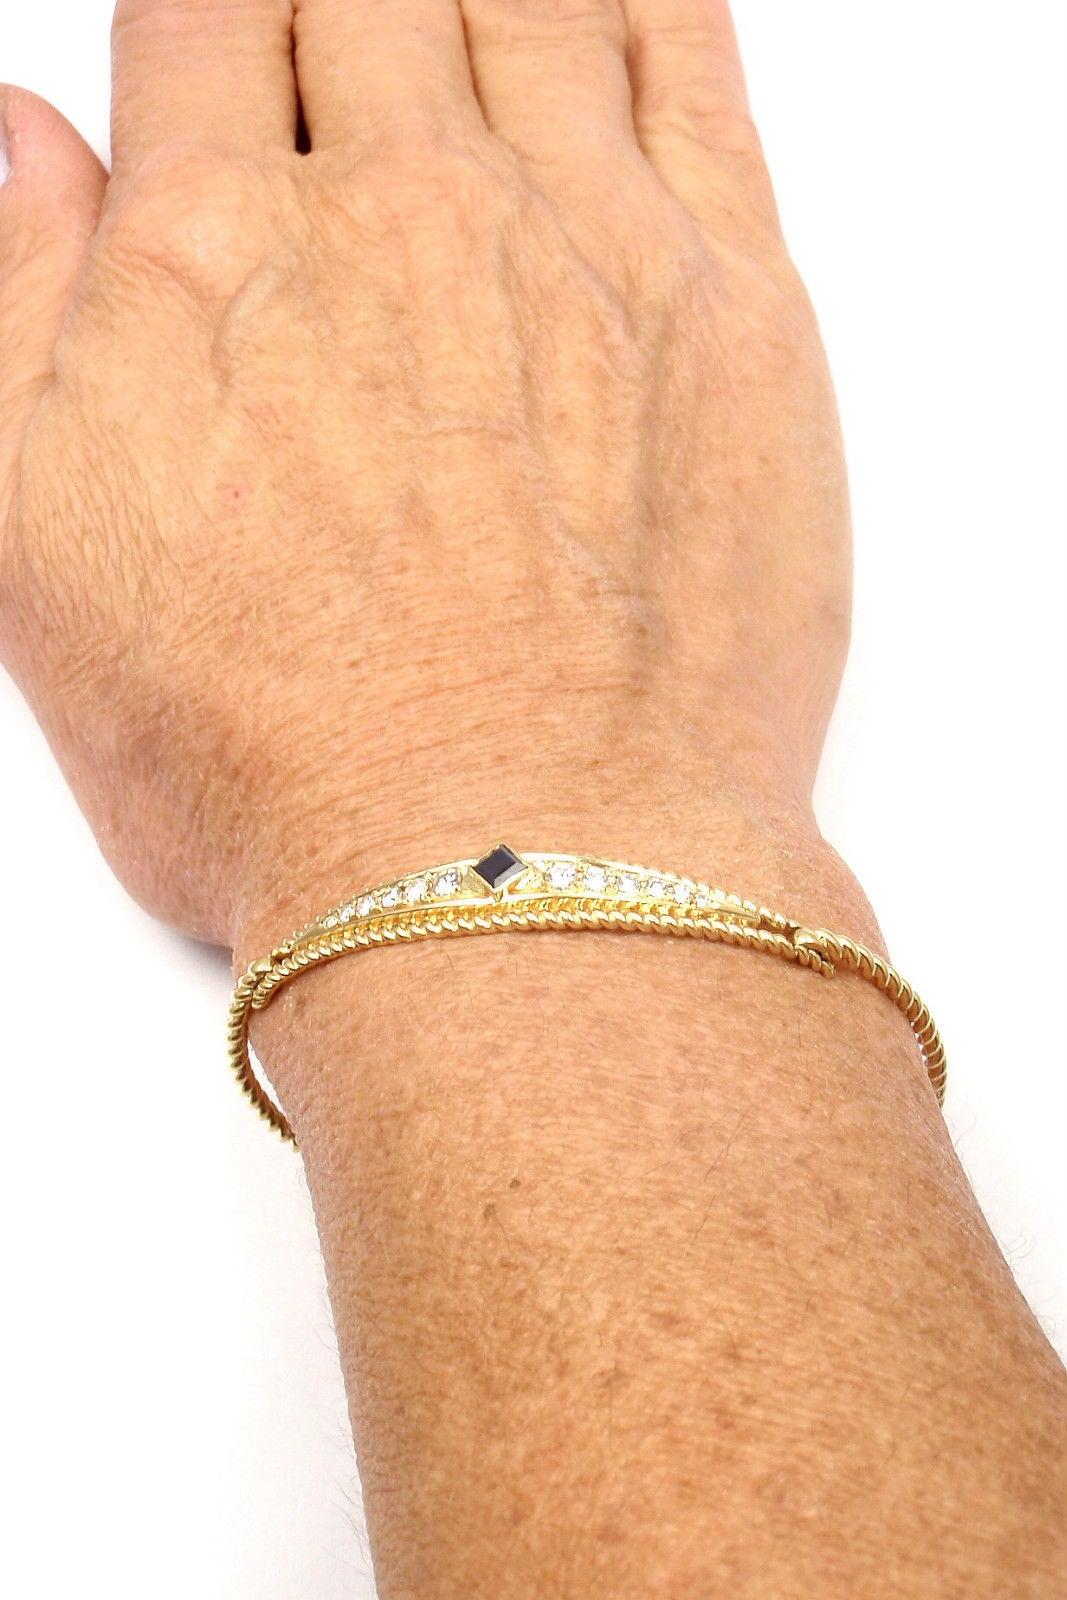 Christian Dior Sapphire Diamond Yellow Gold Bangle Bracelet For Sale 4